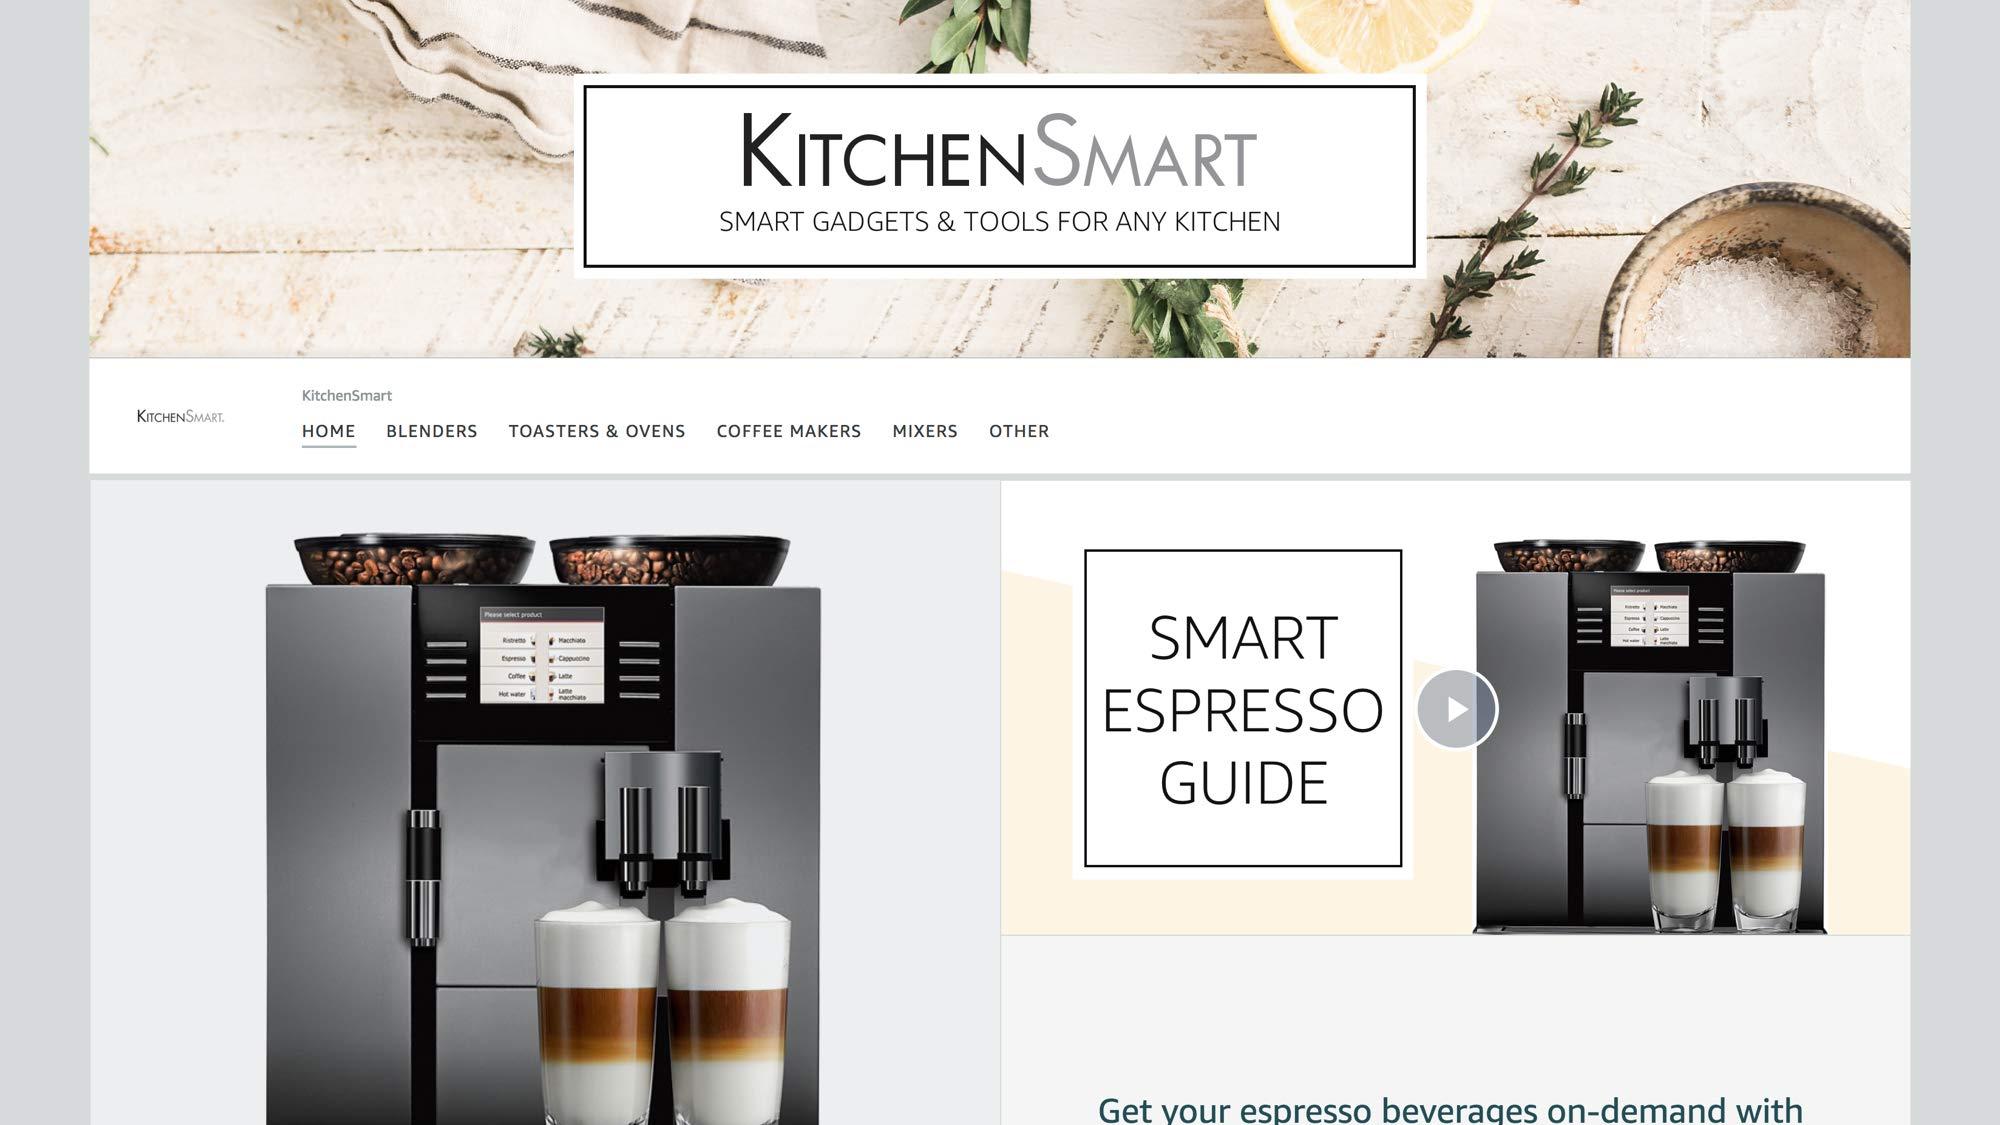 KitchenSmart